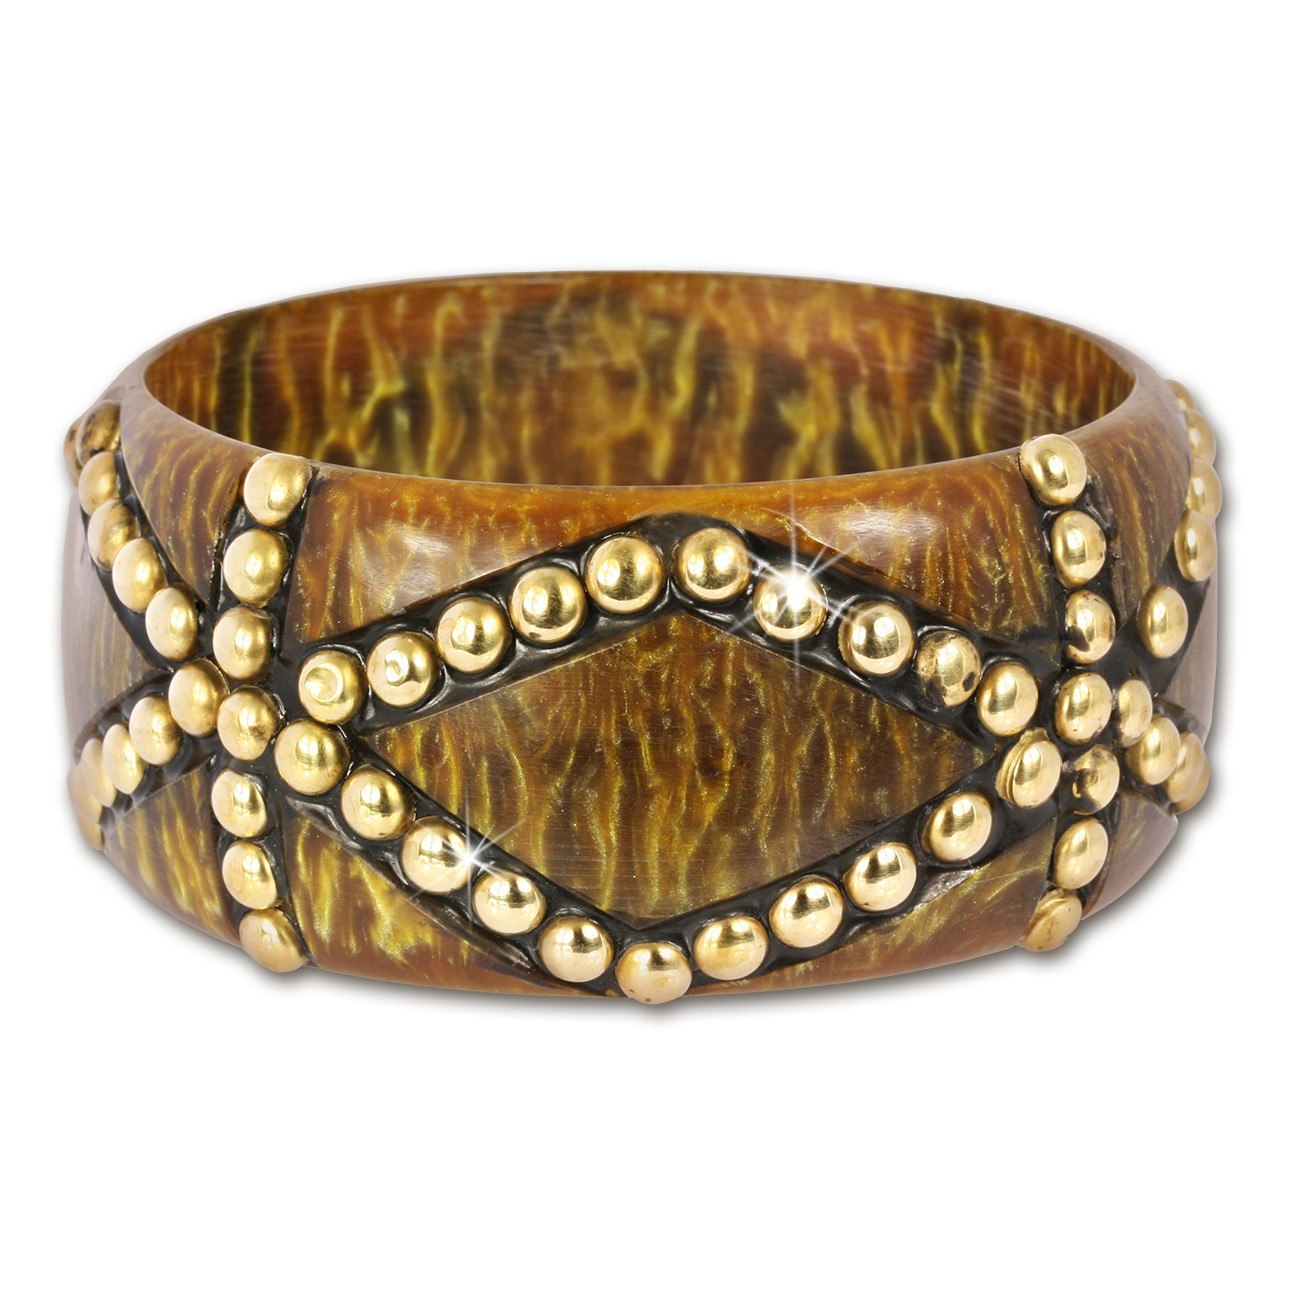 SilberDream Armreif Muster braun gold Damen Armreifen RAV228Y